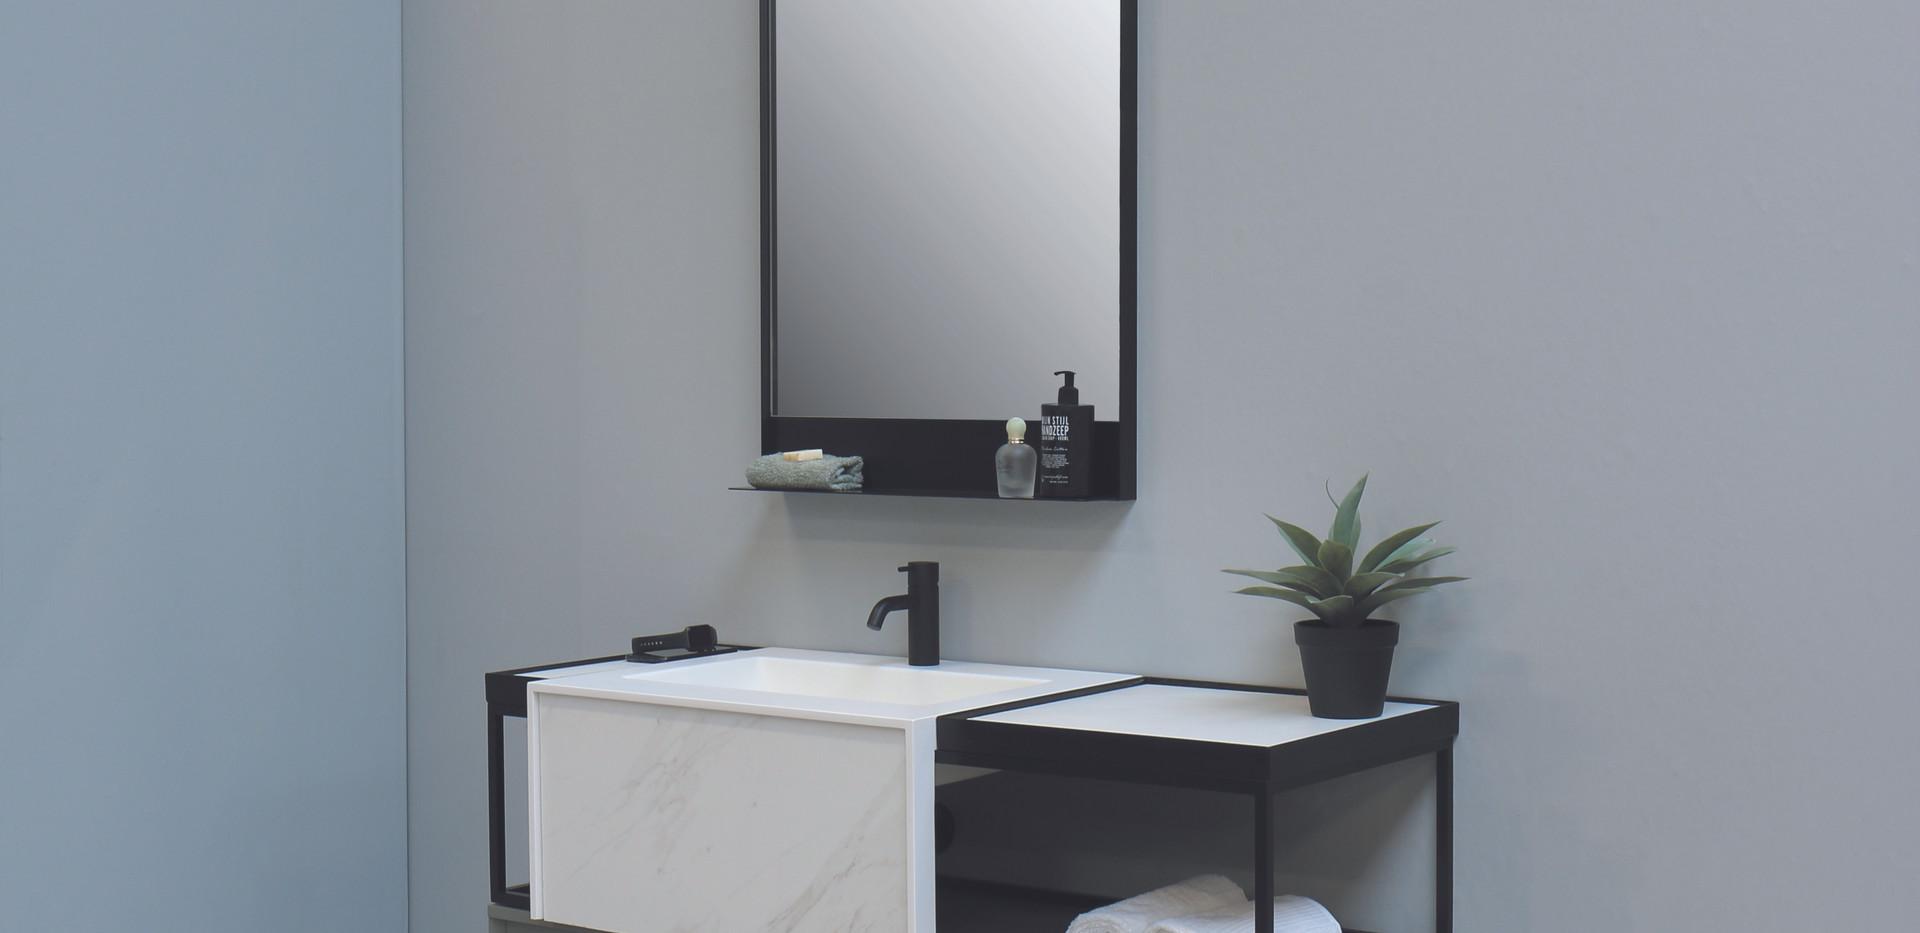 Tilo met ferro frame - totaal(1).jpg